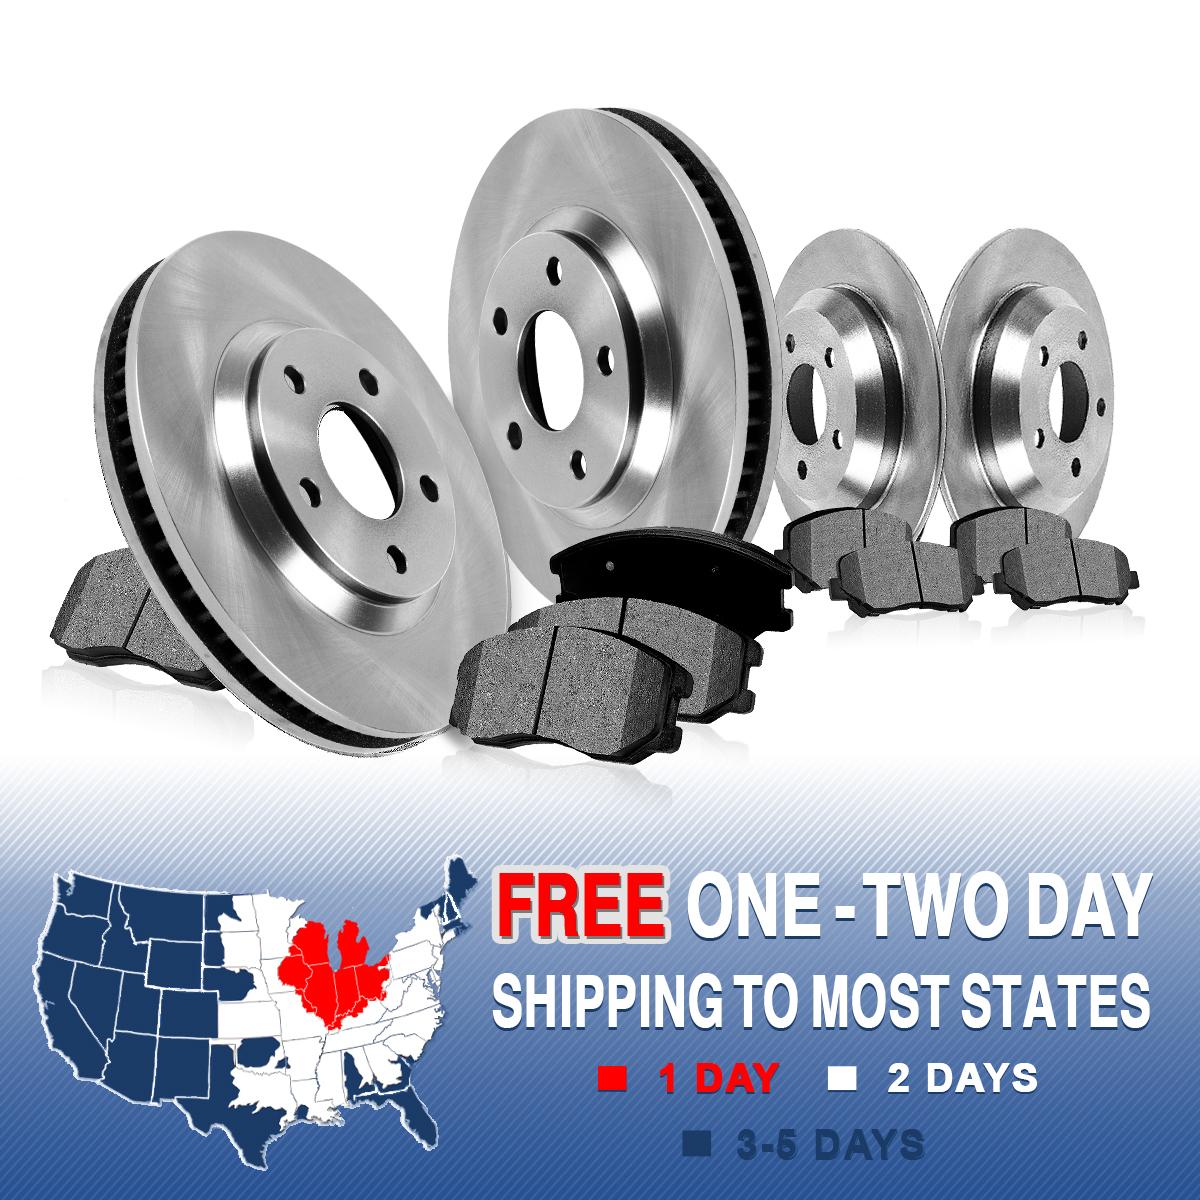 Ceramic Vs Metallic Brake Pads >> Front and Rear Rotors & Metallic Pads 2000 2001 2002 2003 2004 FORD F150 4X4 4WD | eBay